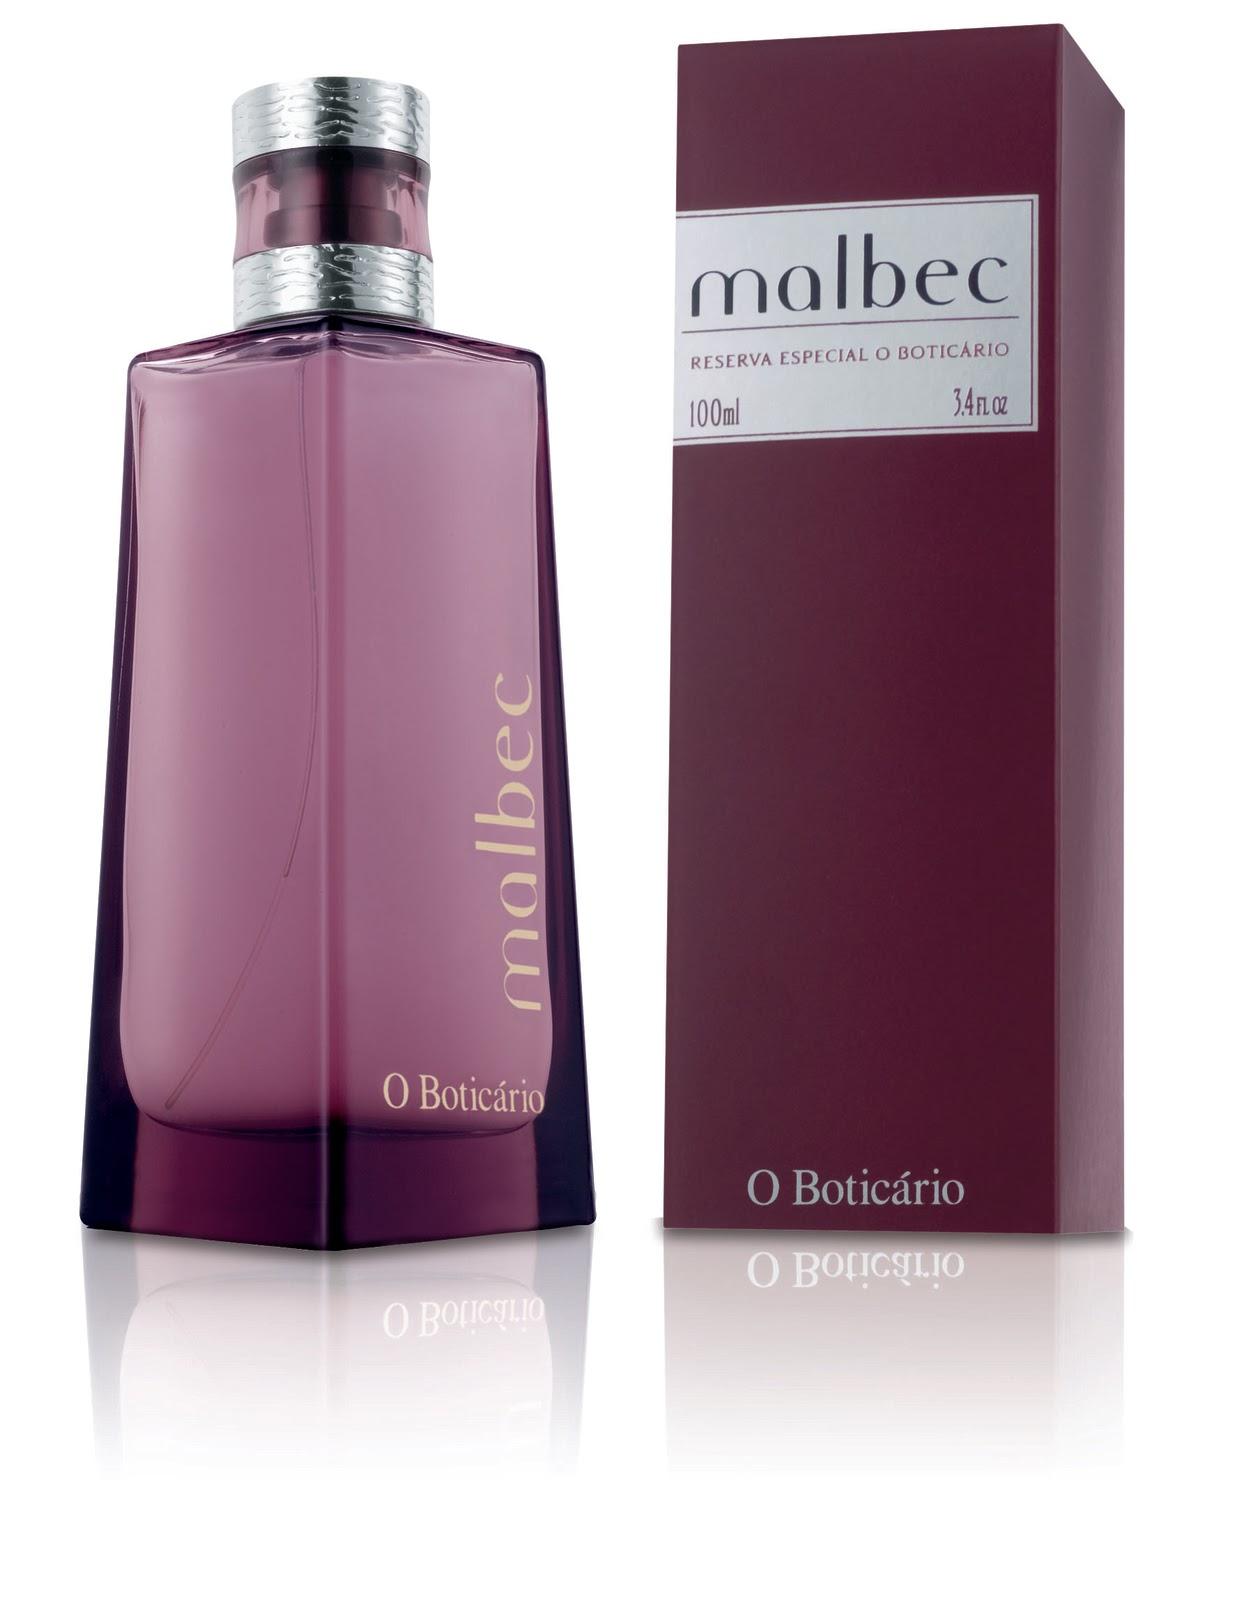 malbec boticario perfume atrair mulher